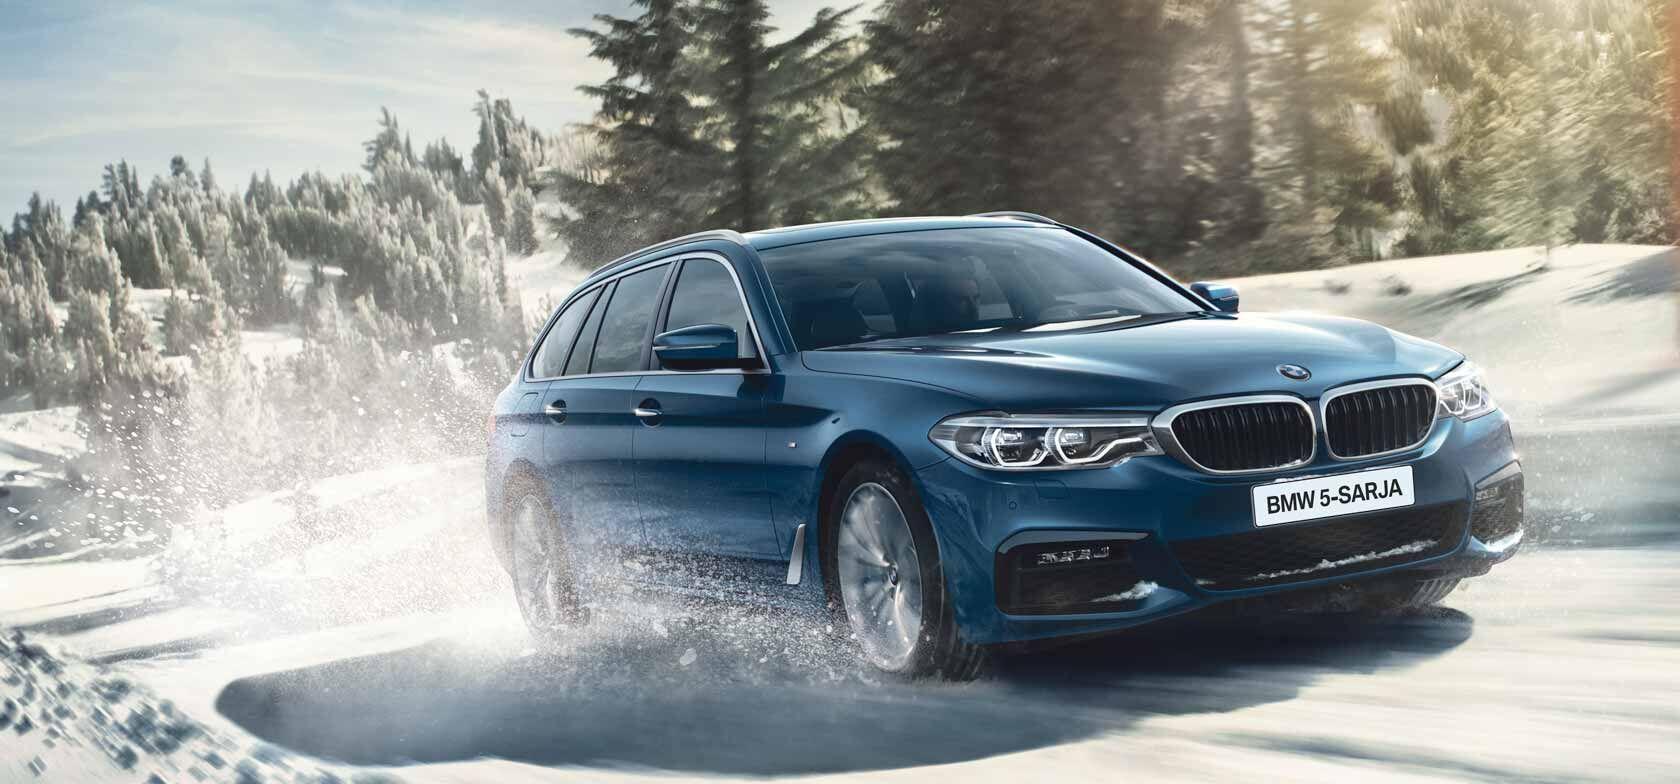 BMW 5-SARJAAN xDRIVE -NELIVETO NYT 490 €